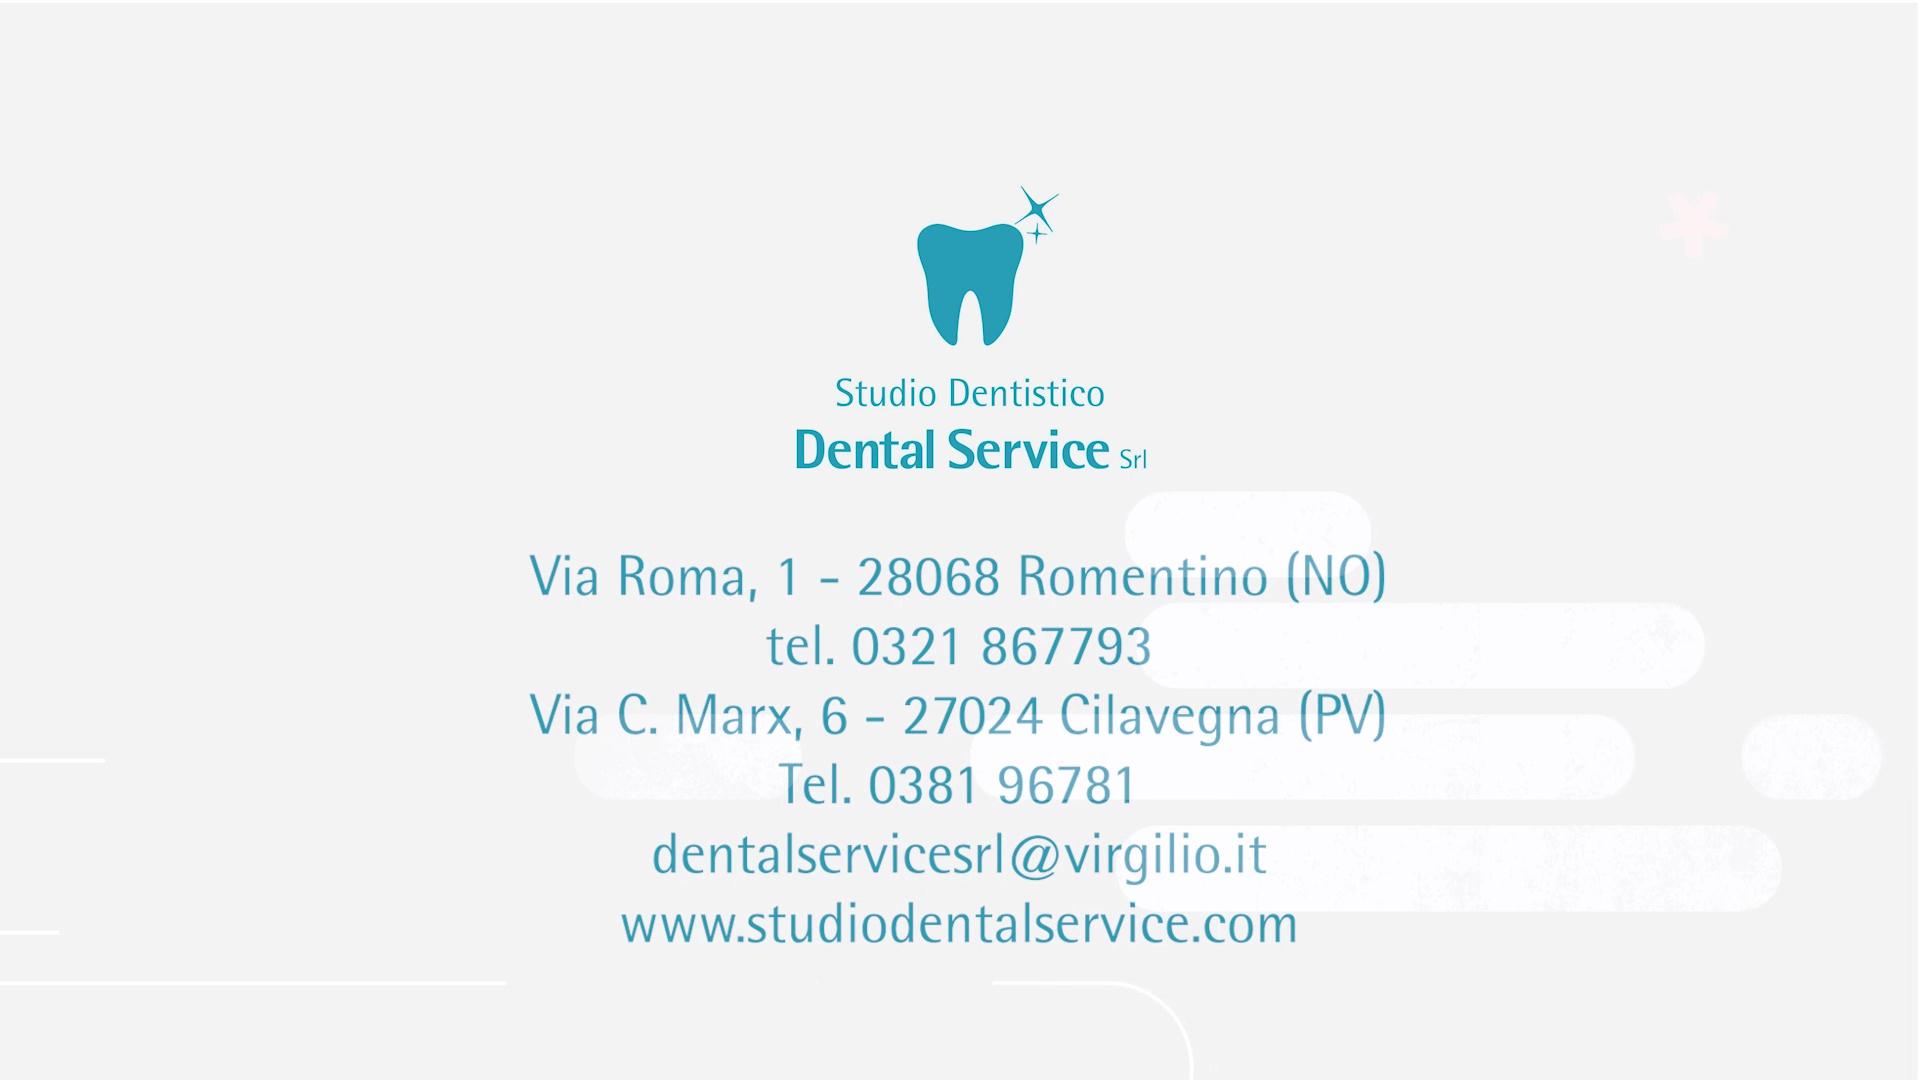 Dental Service SRL + ROMENTINO + Dentisti medici chirurghi ed odontoiatri